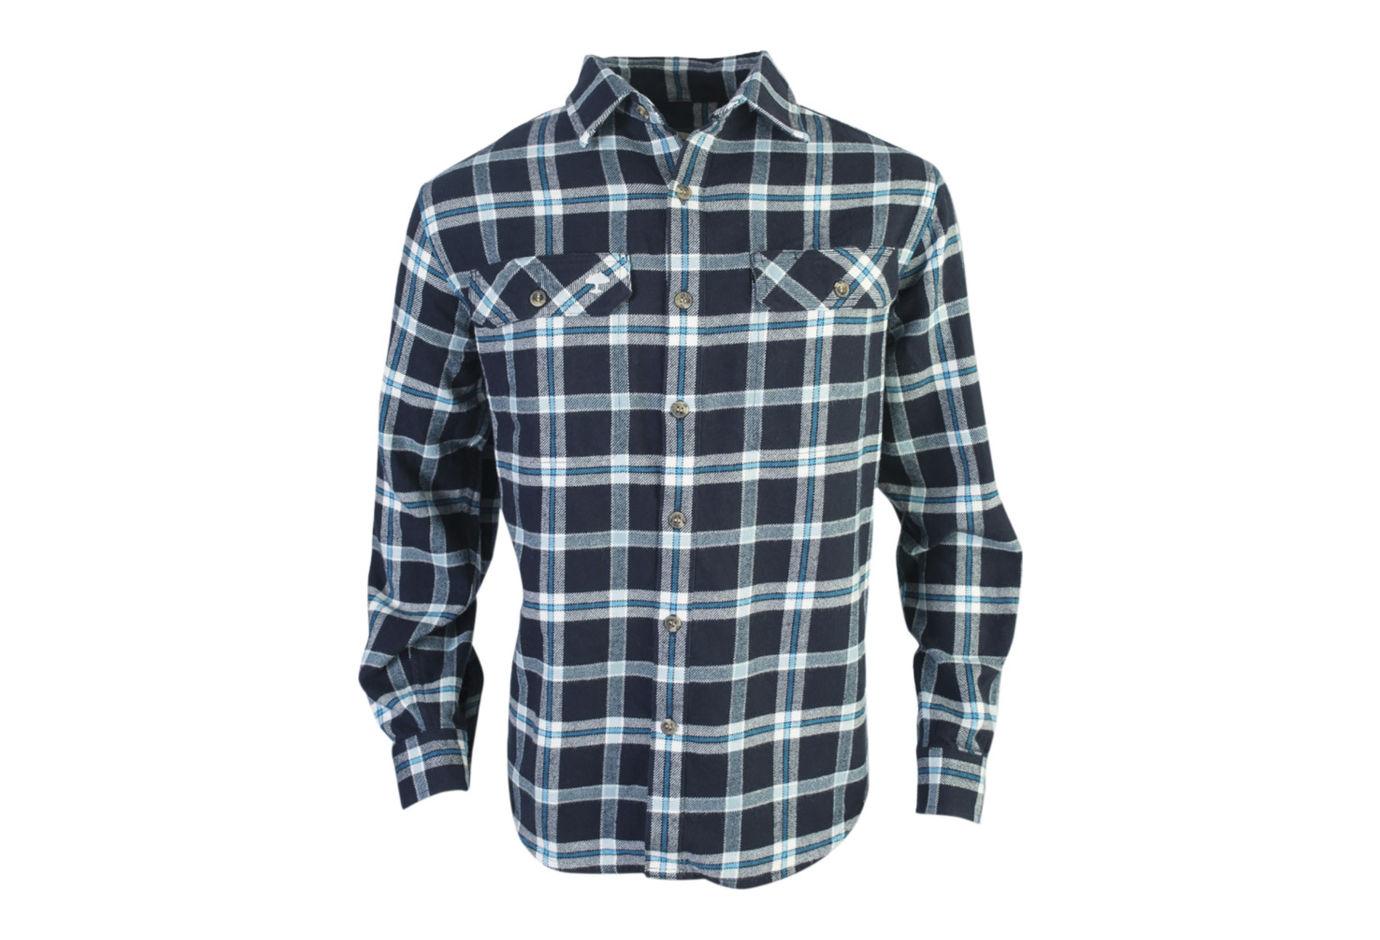 Arborwear Chagrin Flannel Shirt Navy Large